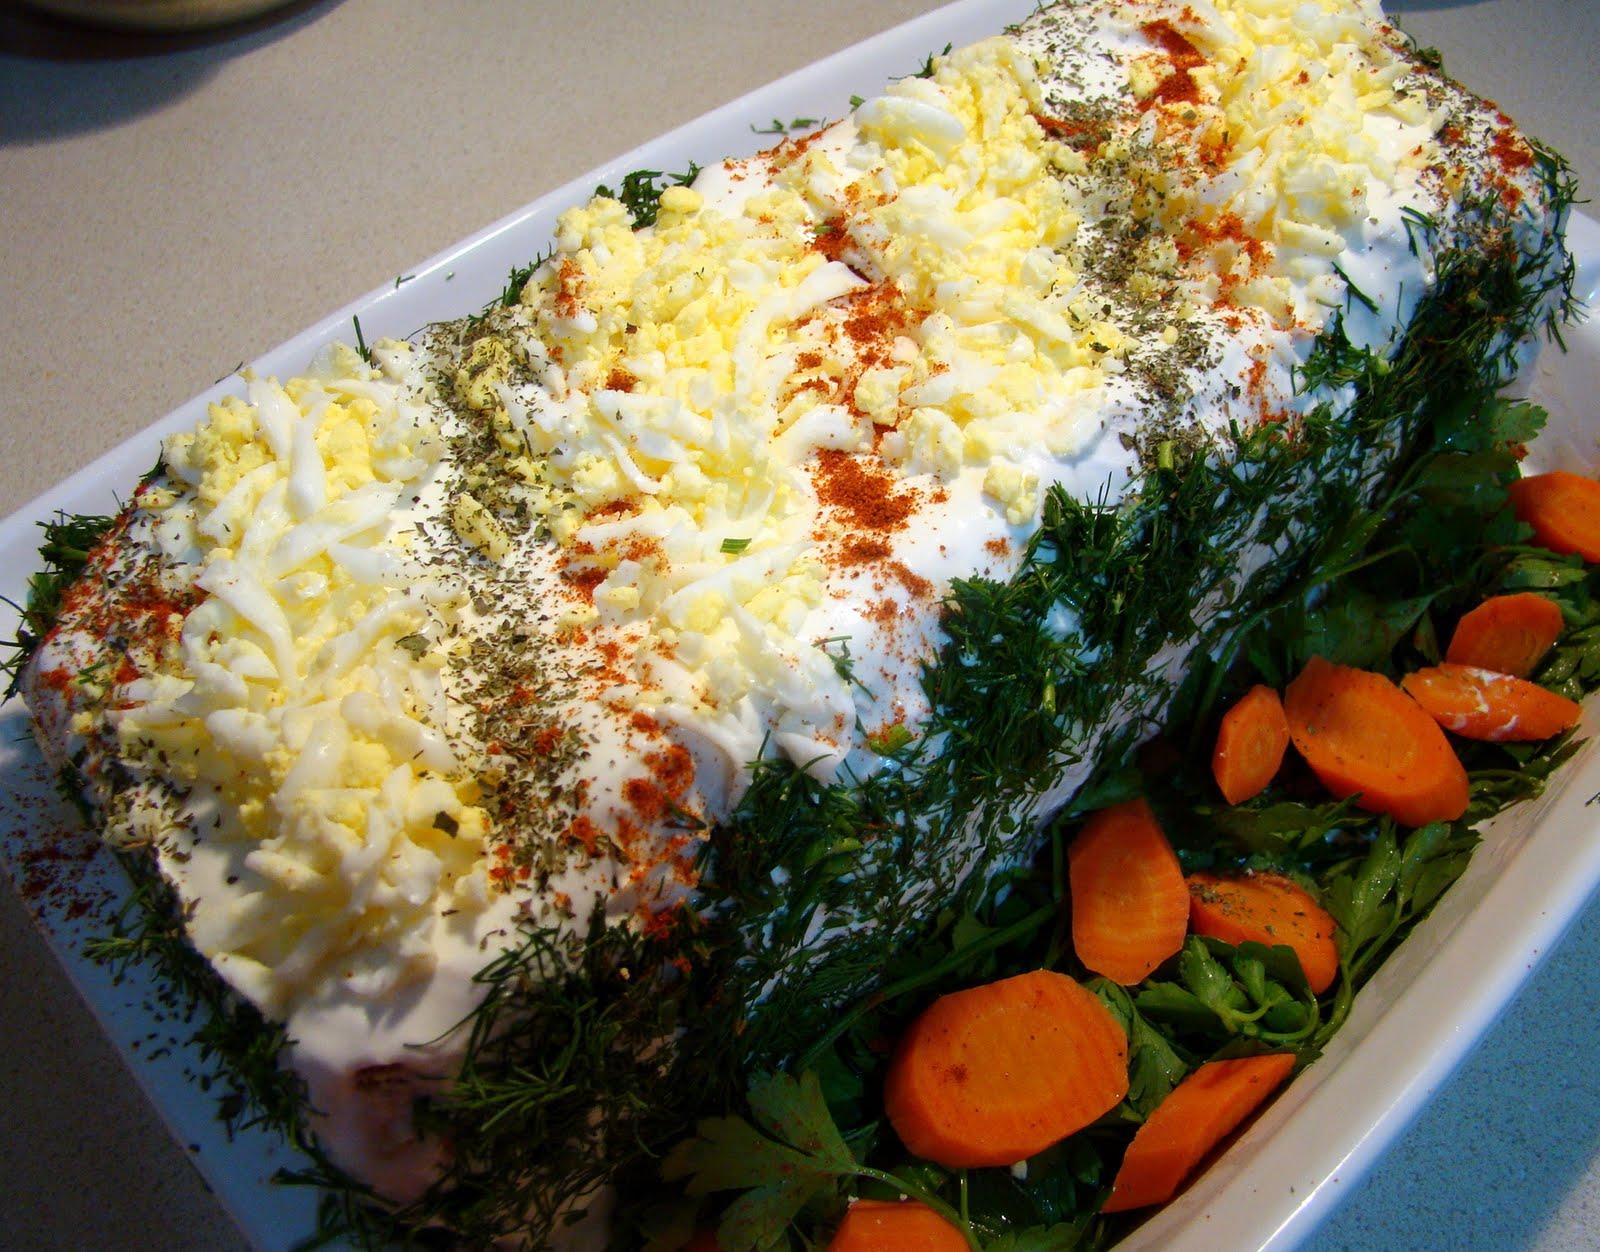 Tost ekmekli tavuklu salata tarifi(resimli anlatım)